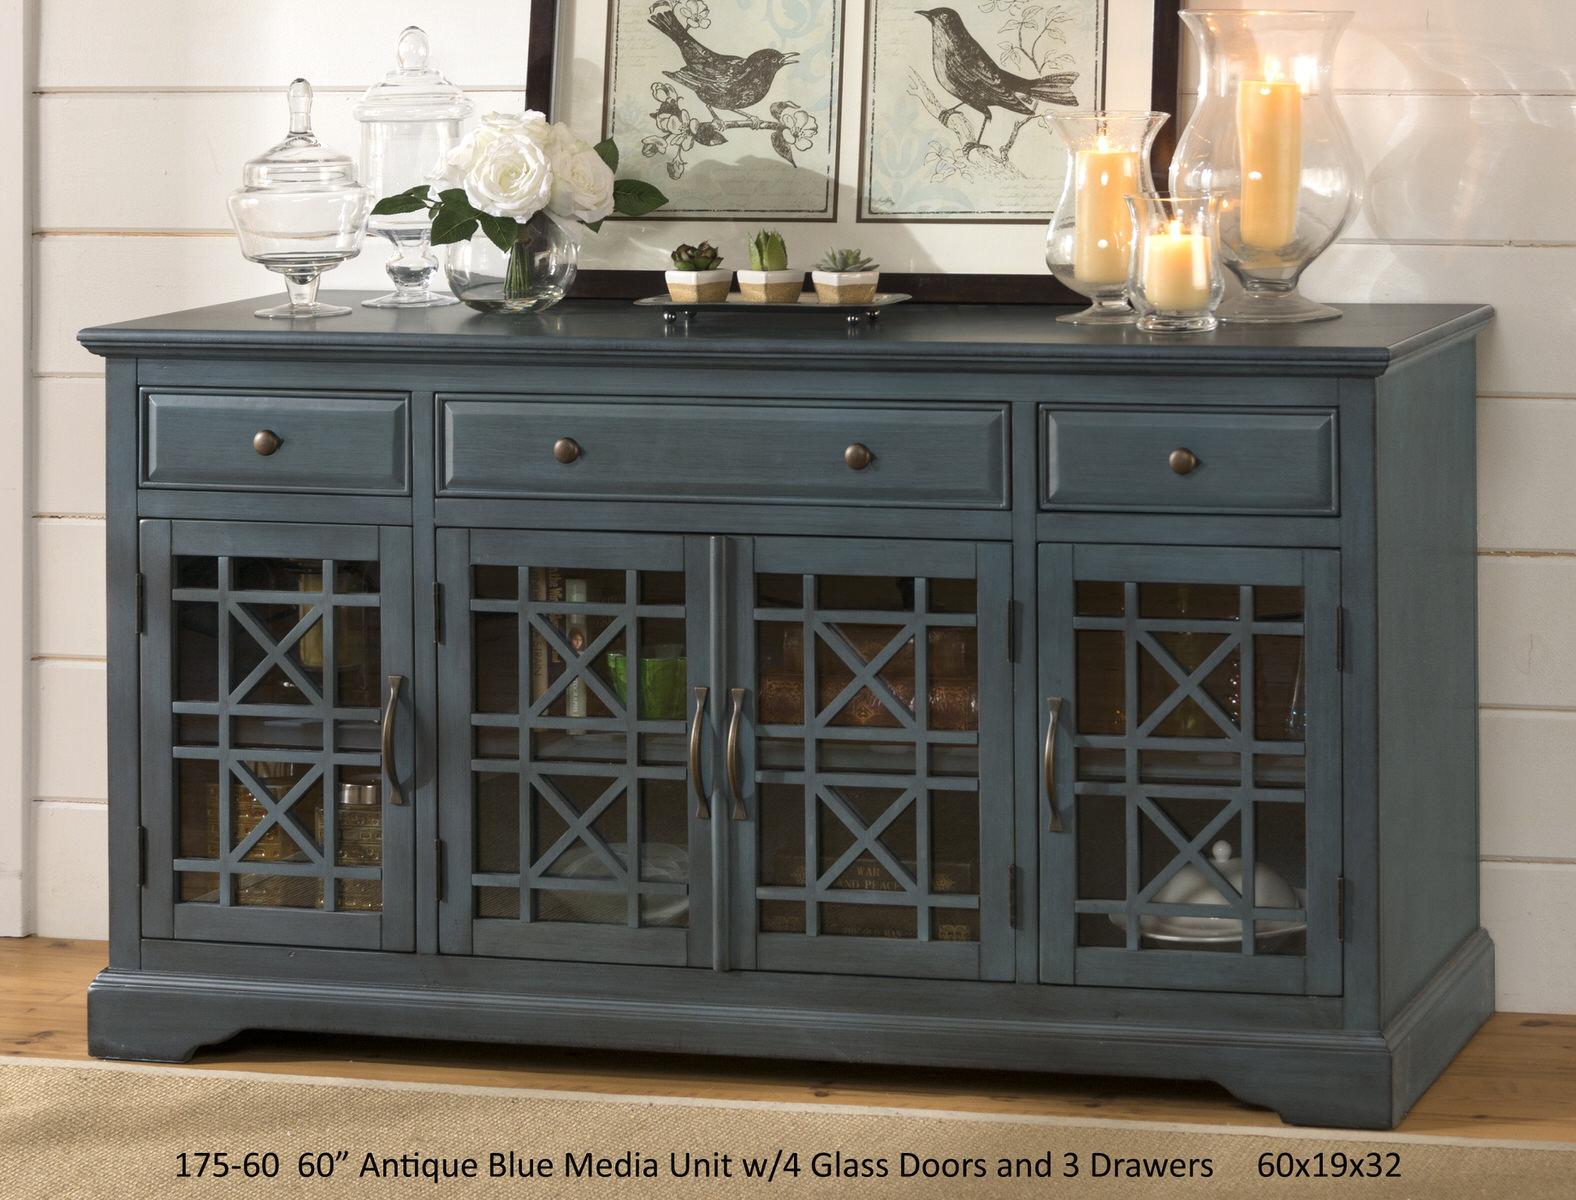 Craftsman Antique Blue 60 Inch Media Unit by Jofran Furniture